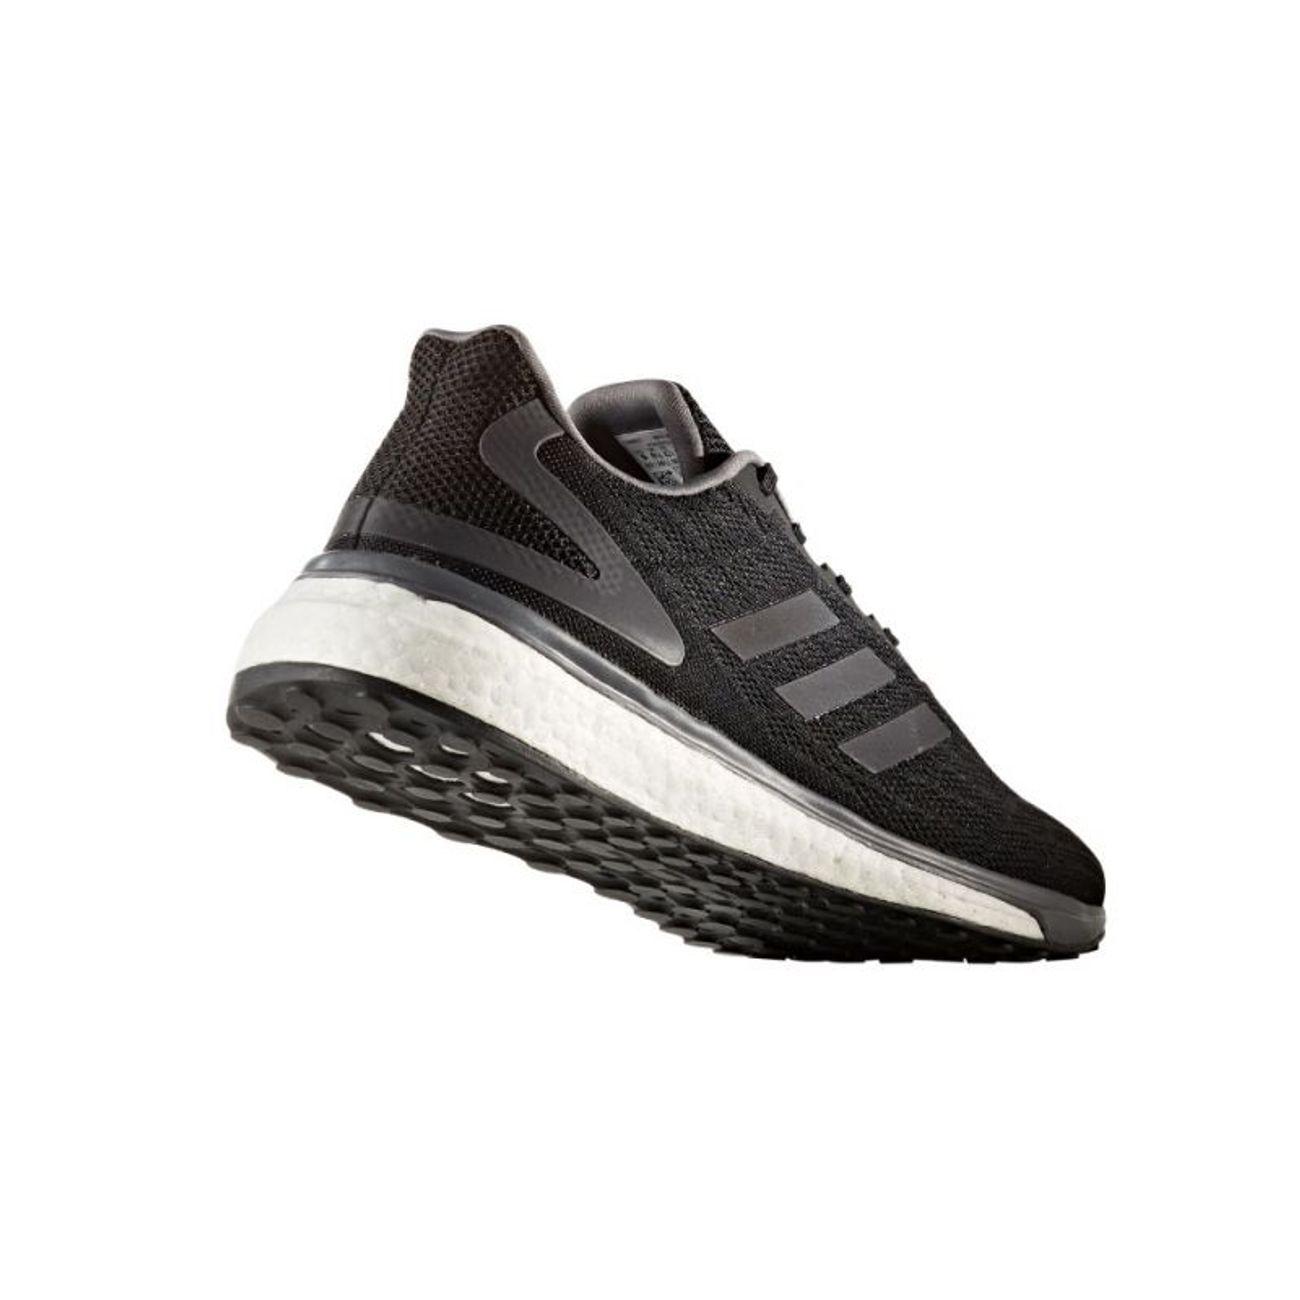 sale retailer e02fd 40f96 ... running homme ADIDAS Adidas - Response lt Hommes chaussure de course ( noir gris) ...